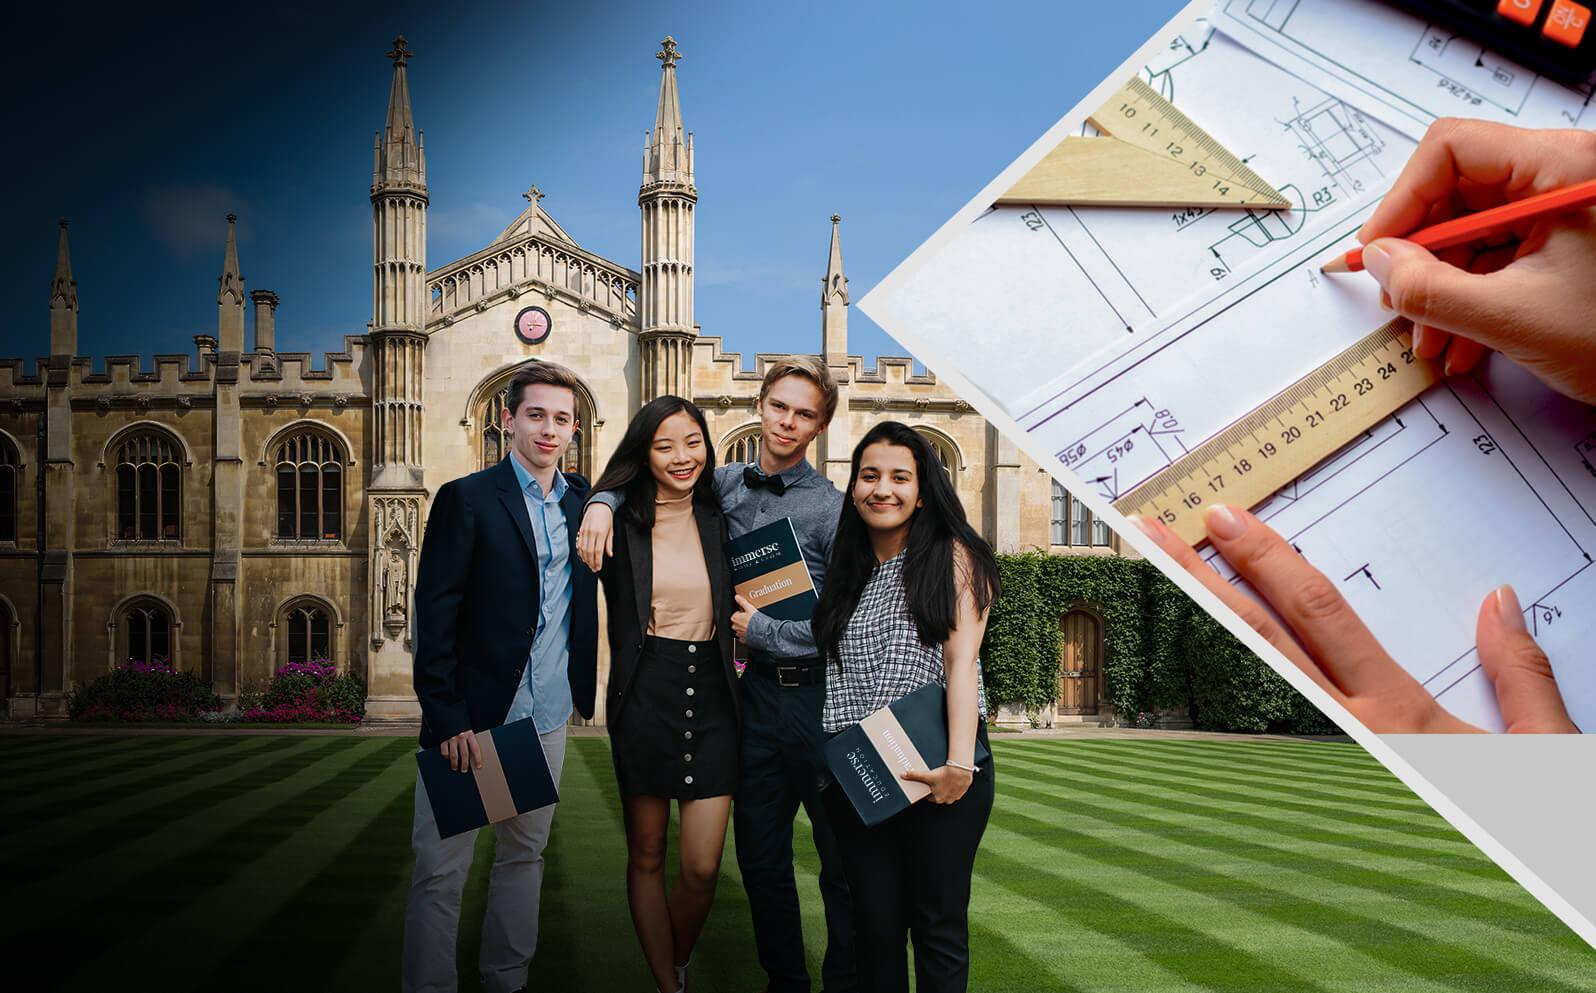 Cambridge Architecture Summer Program for Ages 13-15